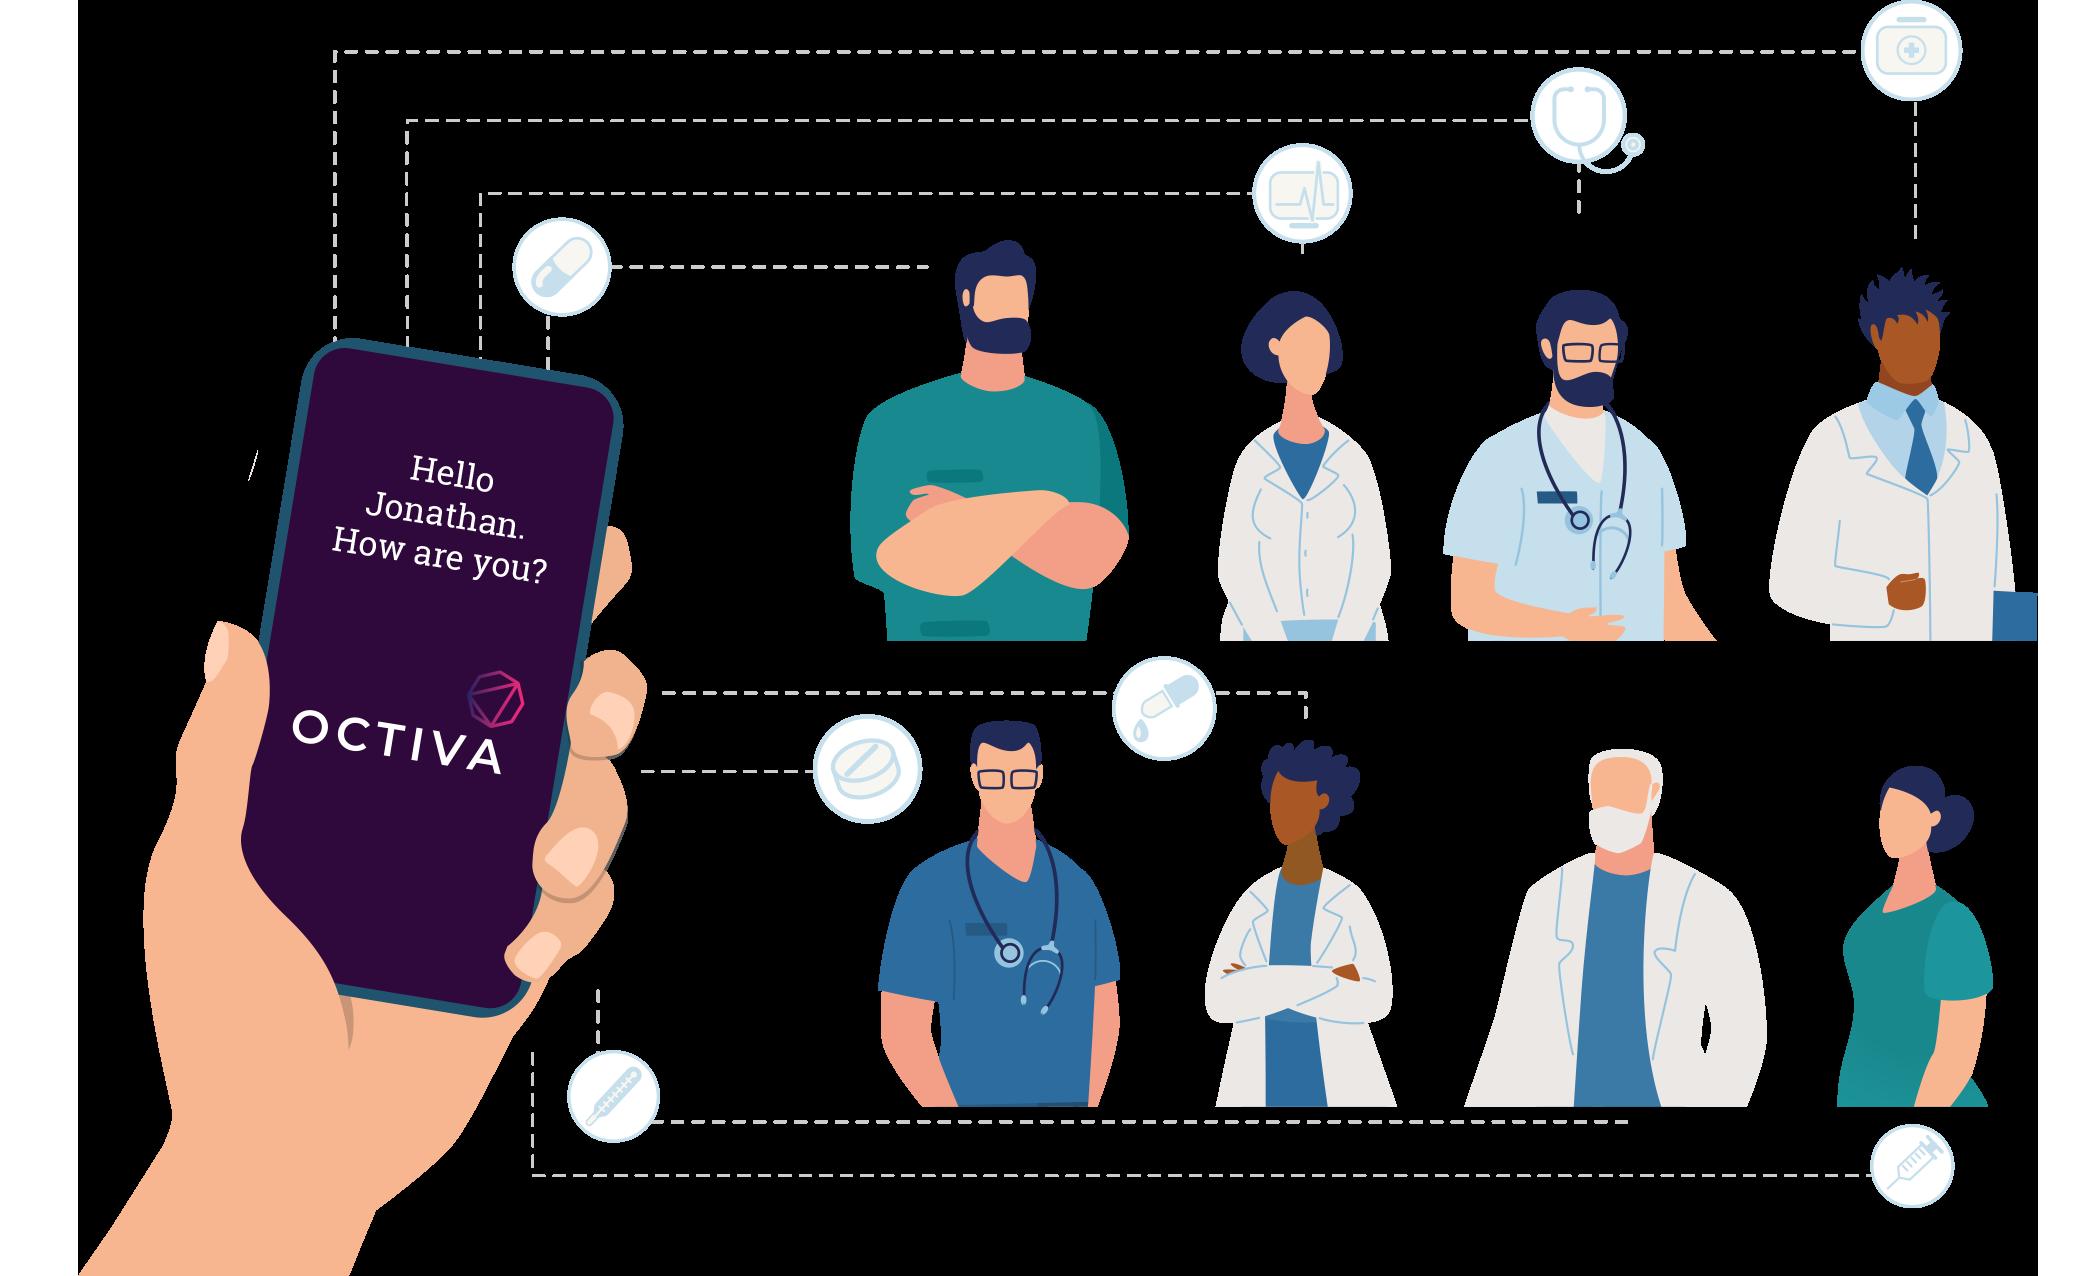 Octiva illustration scope of providers